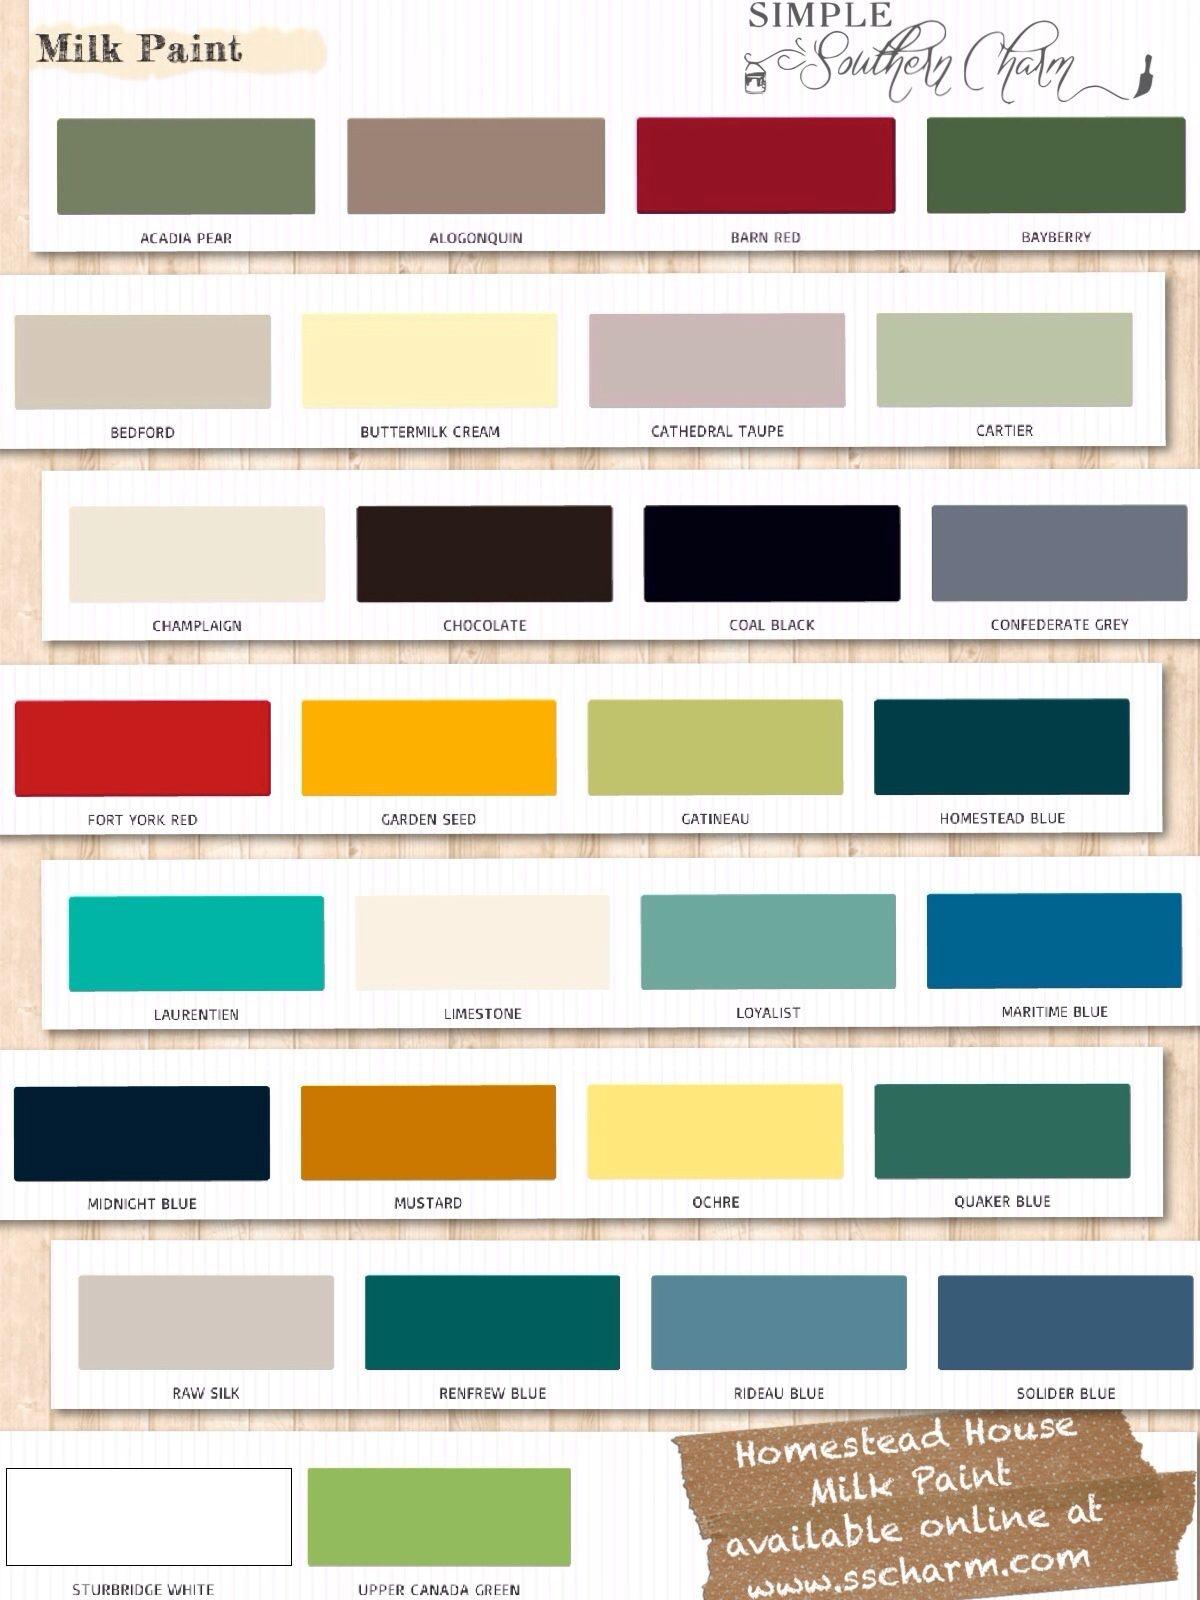 Homestead house milk paint color chart home paint chips homestead house milk paint color chart nvjuhfo Choice Image